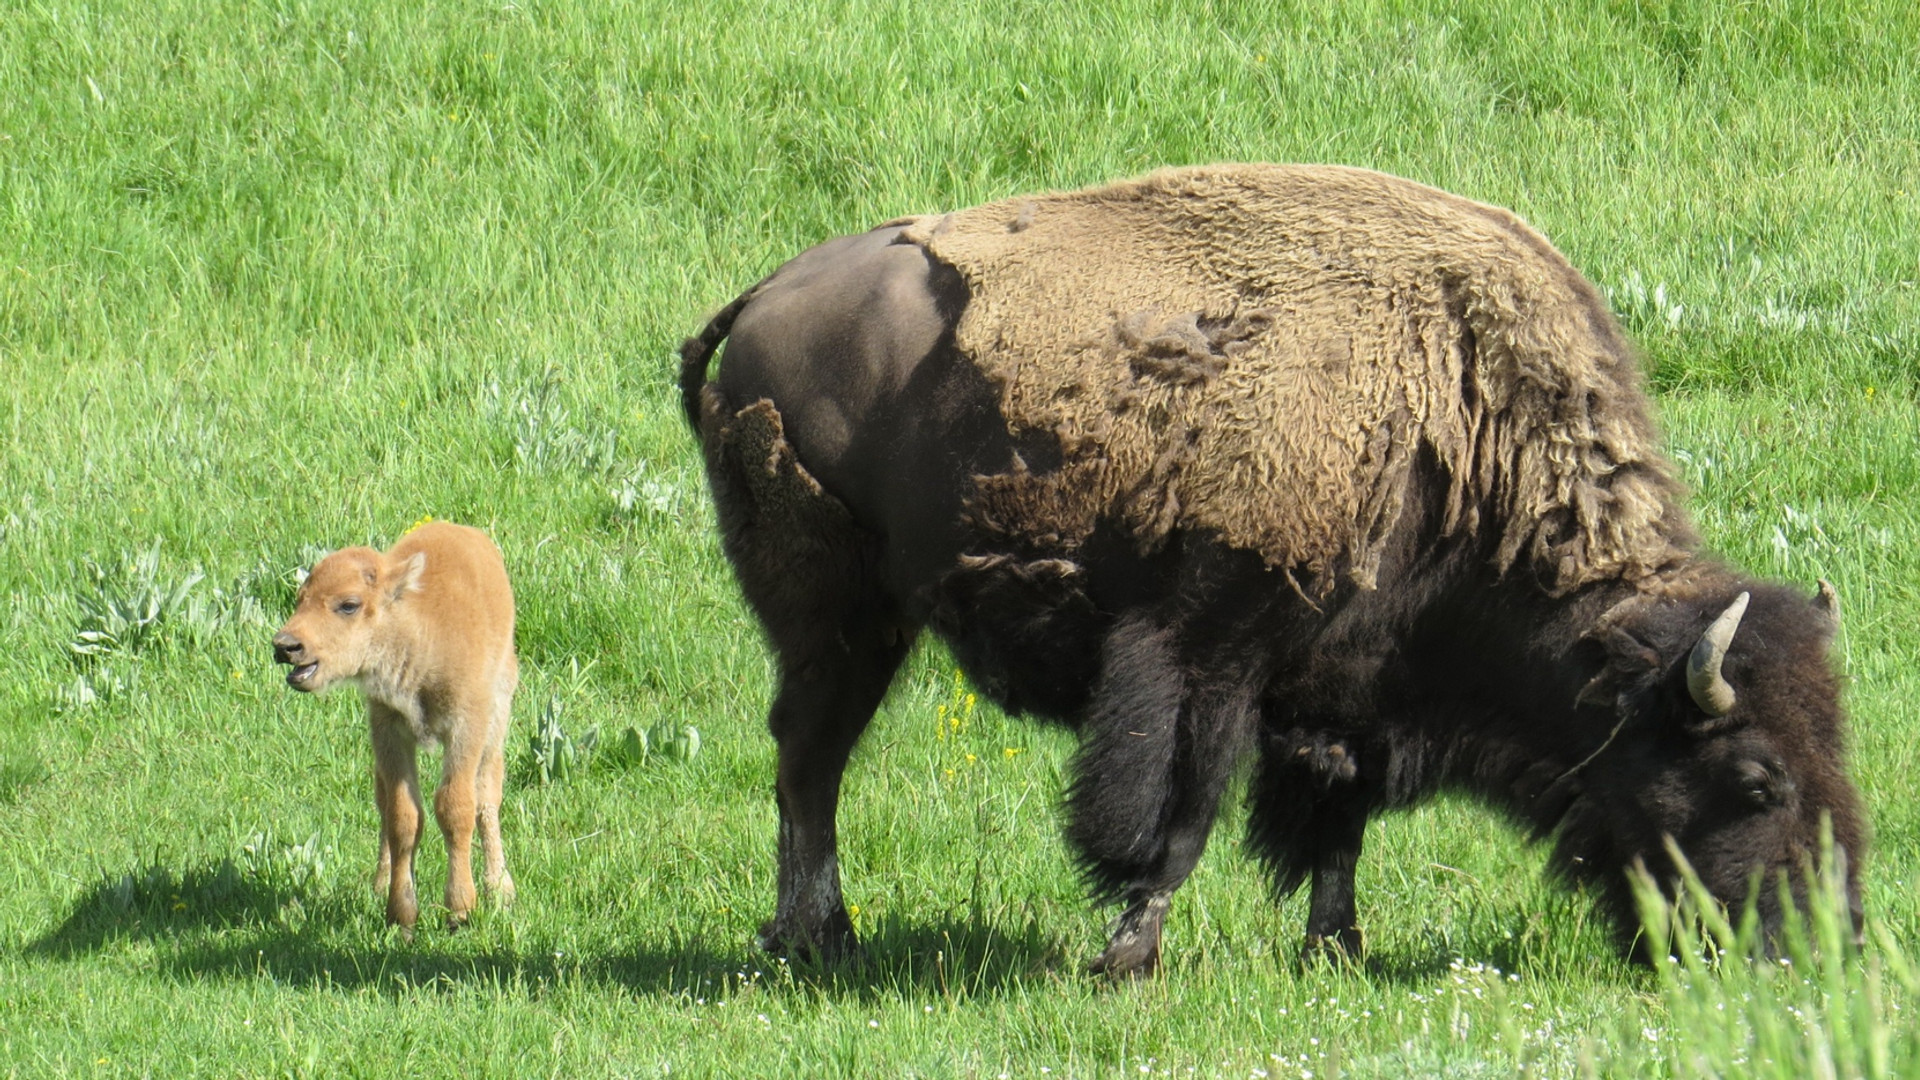 Yellowstone-tour-bison-and-calf